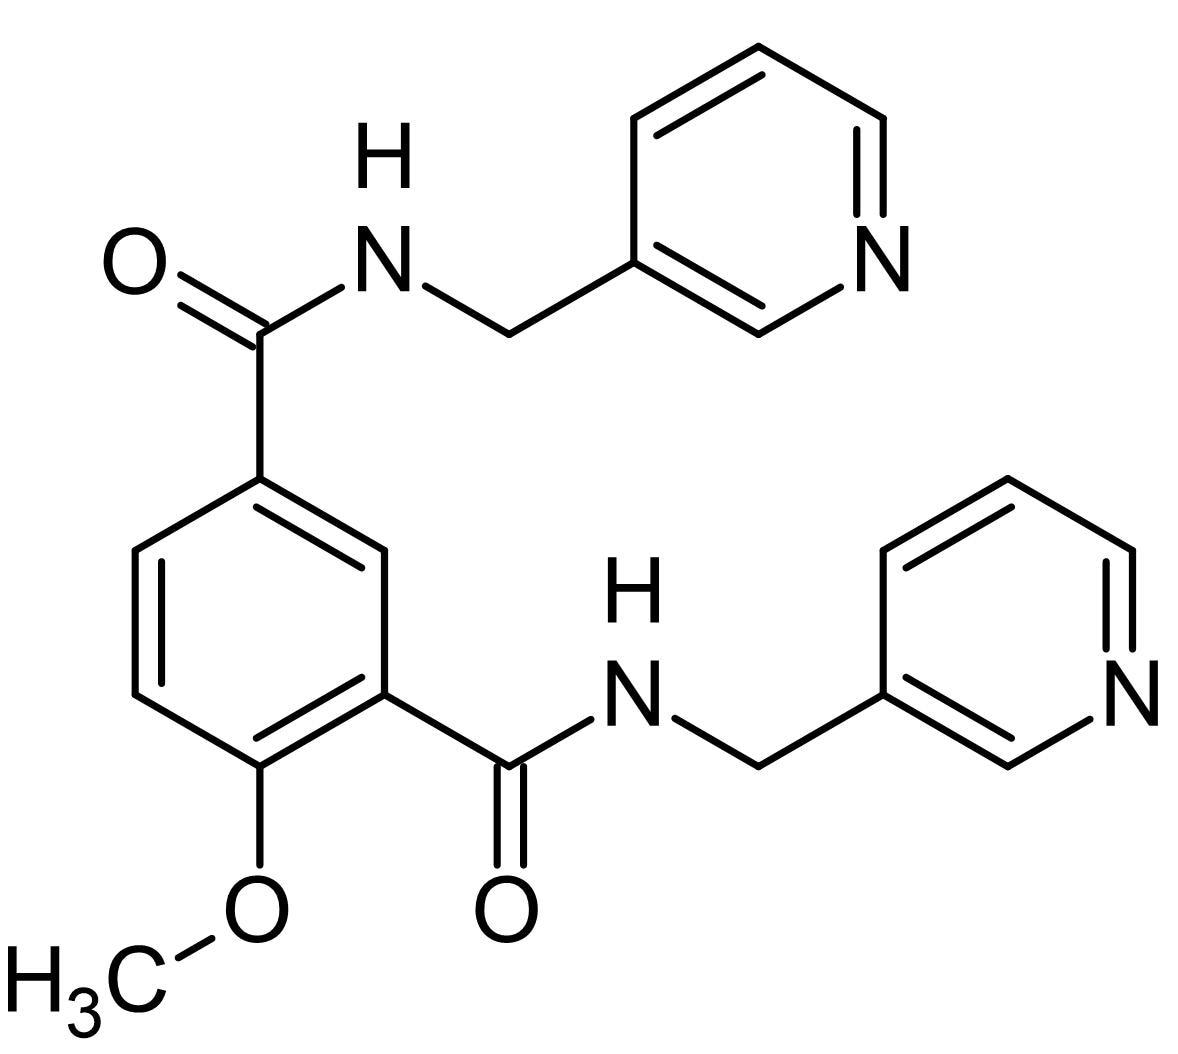 Chemical Structure - Picotamide, Thromboxane A<sub>2</sub> antagonist and TXA<sub>2</sub> synthase inhibitor (ab145239)